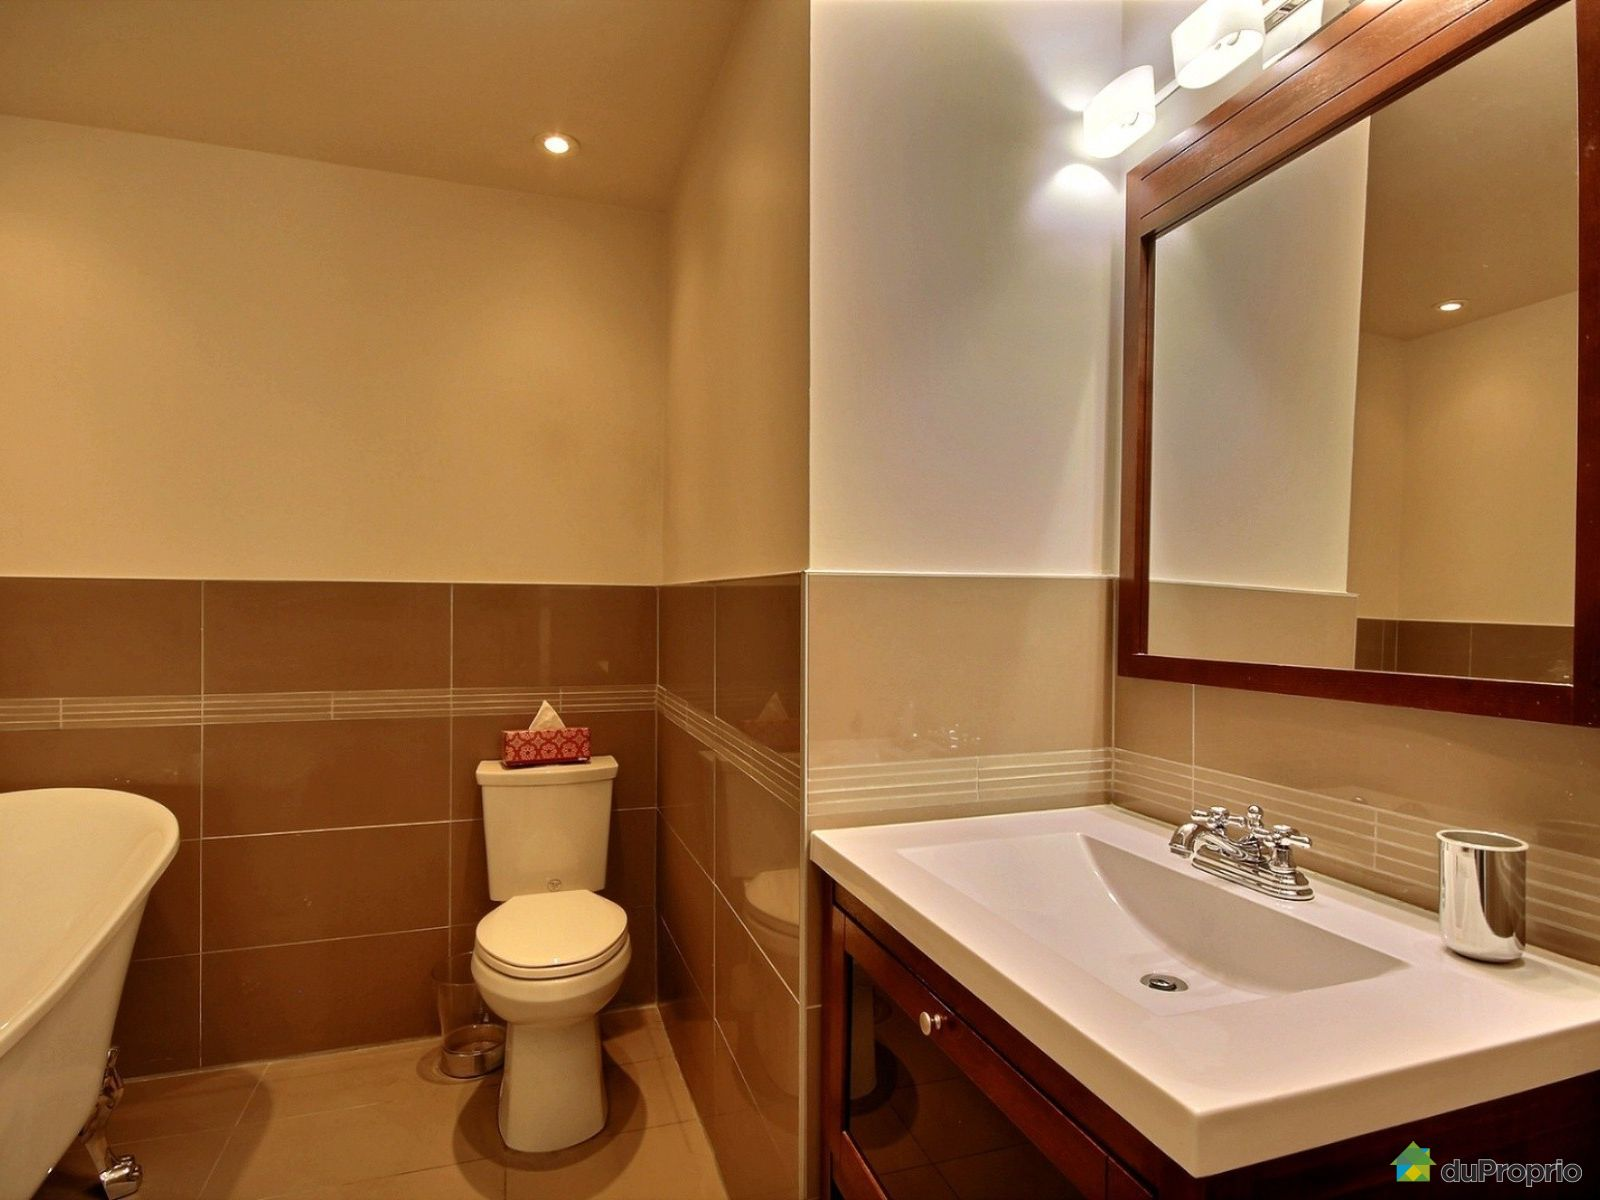 Jumel vendre longueuil 1521 rue labrie immobilier for Salle de bain longueuil